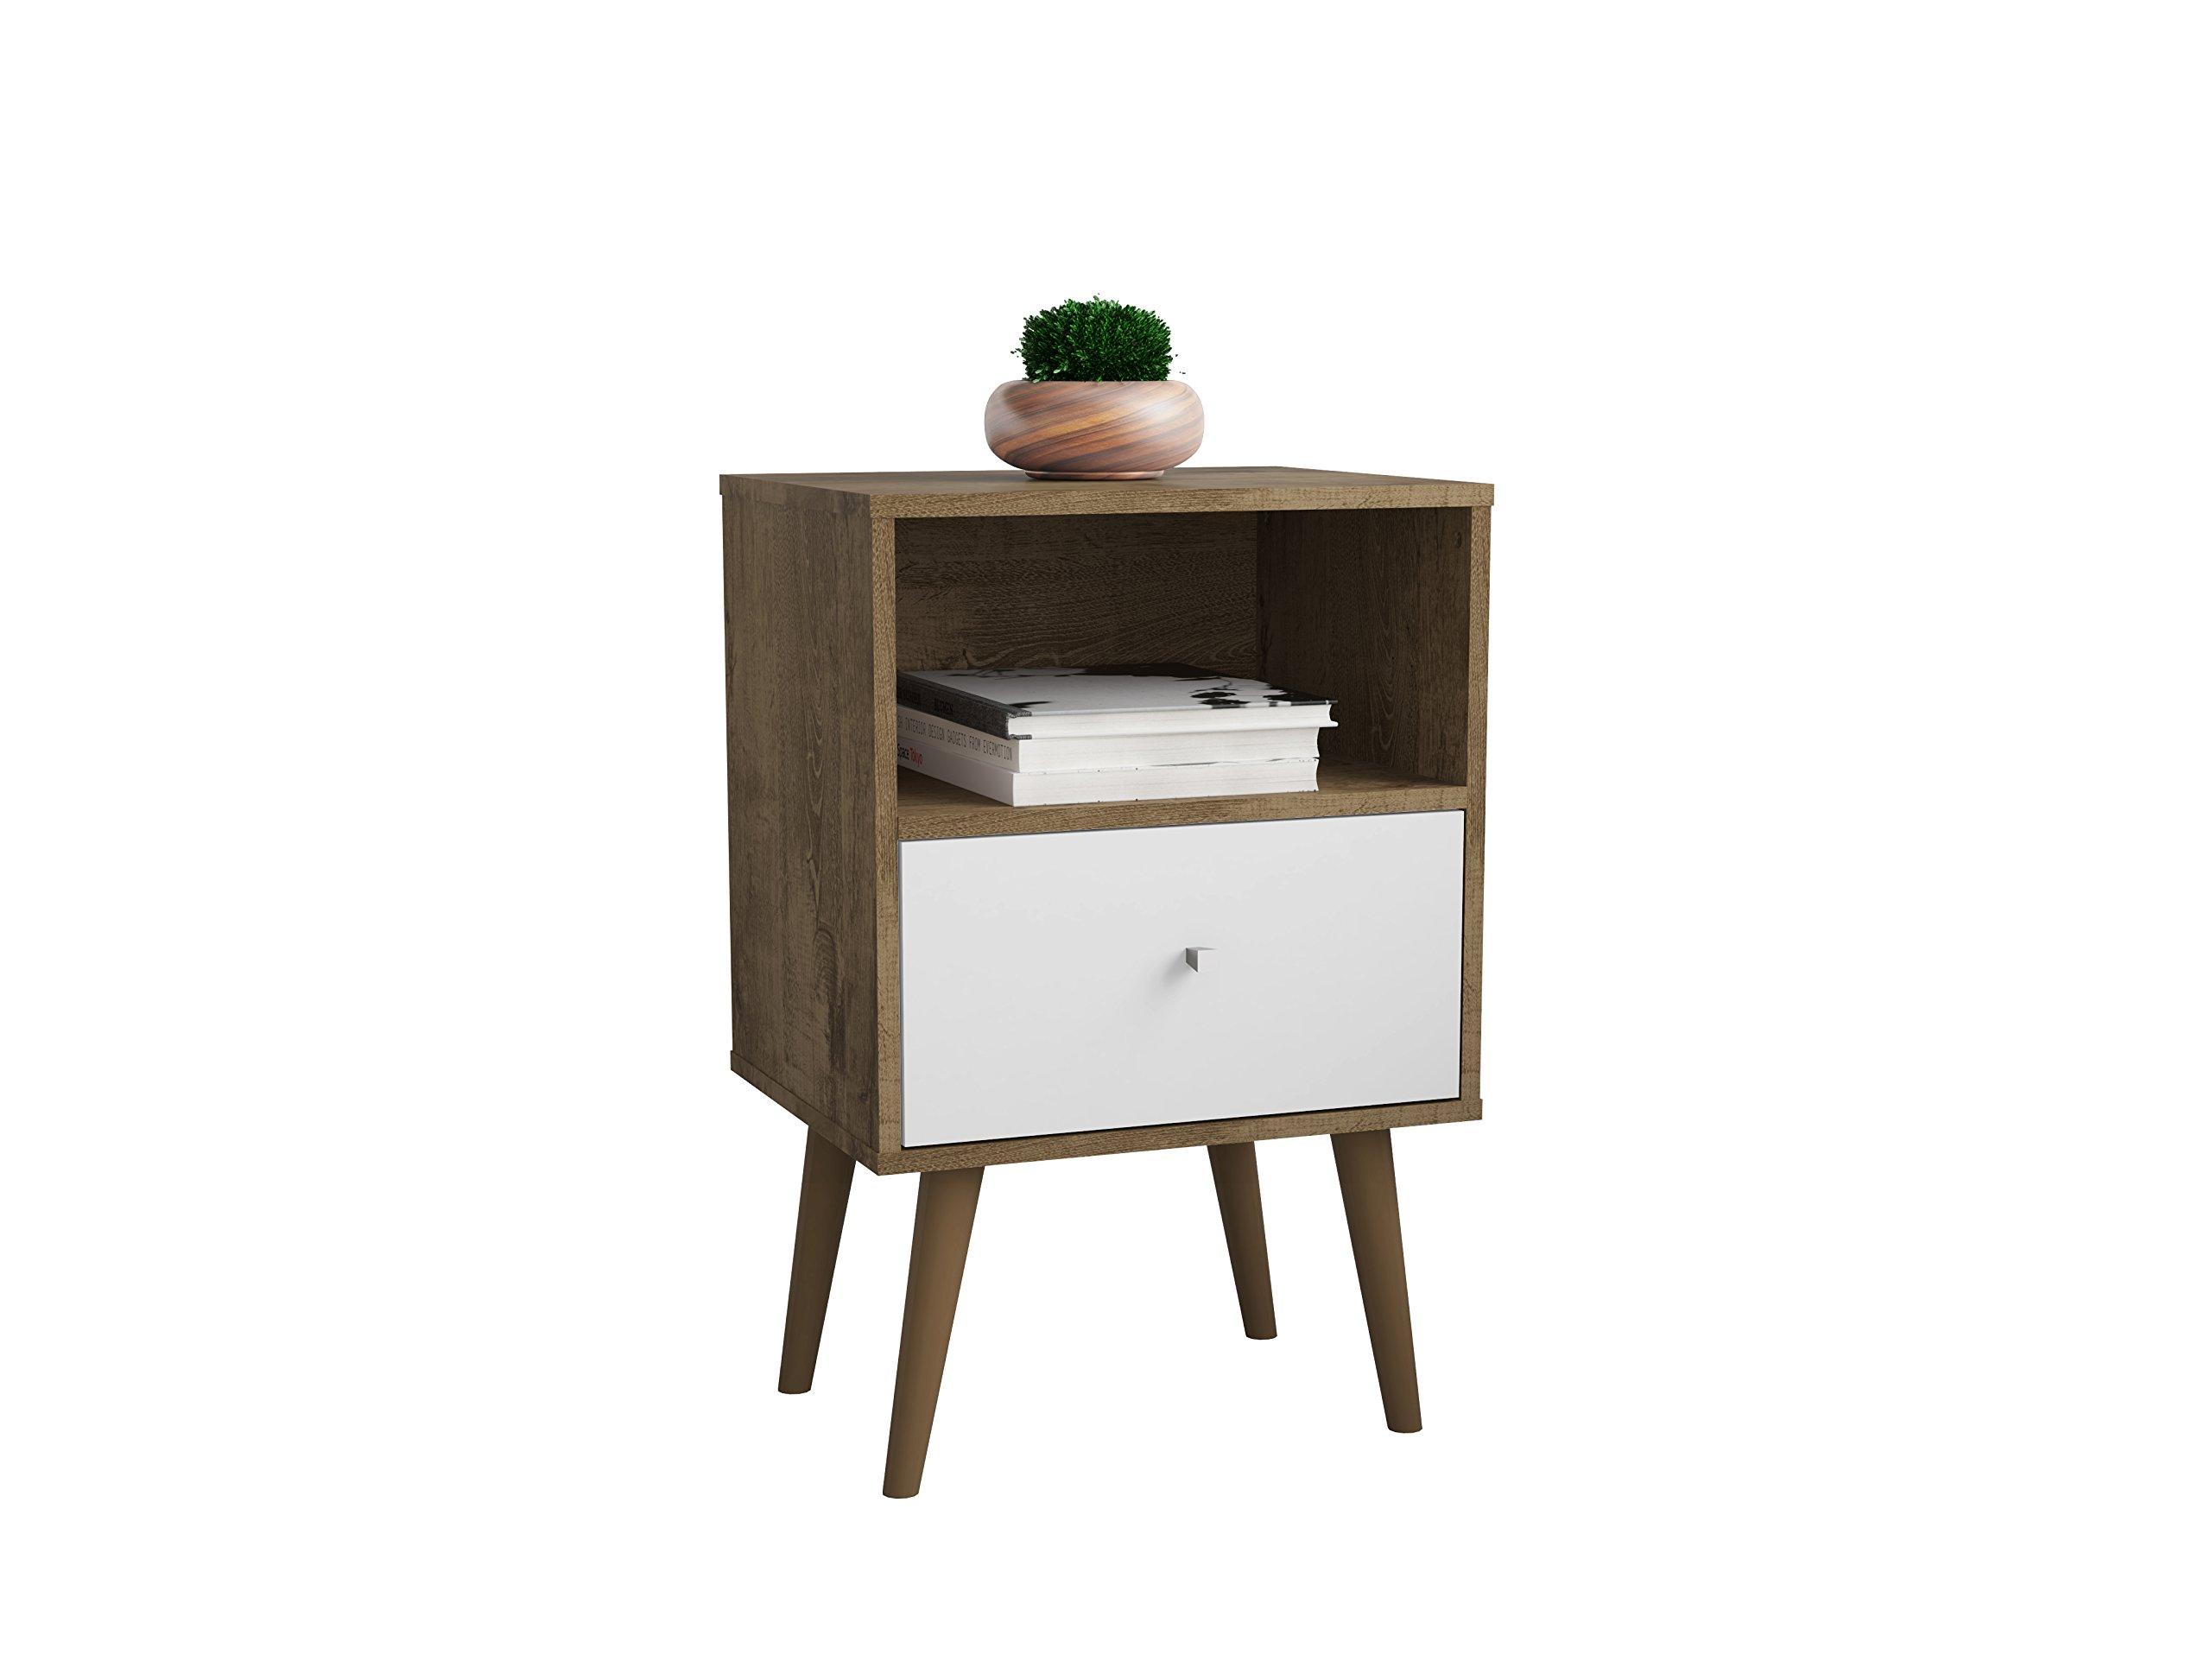 Manhattan Comfort 203AMC96 Liberty Modern 1 Drawer Bedroom Nightstand/End Table, Rustic Brown/White